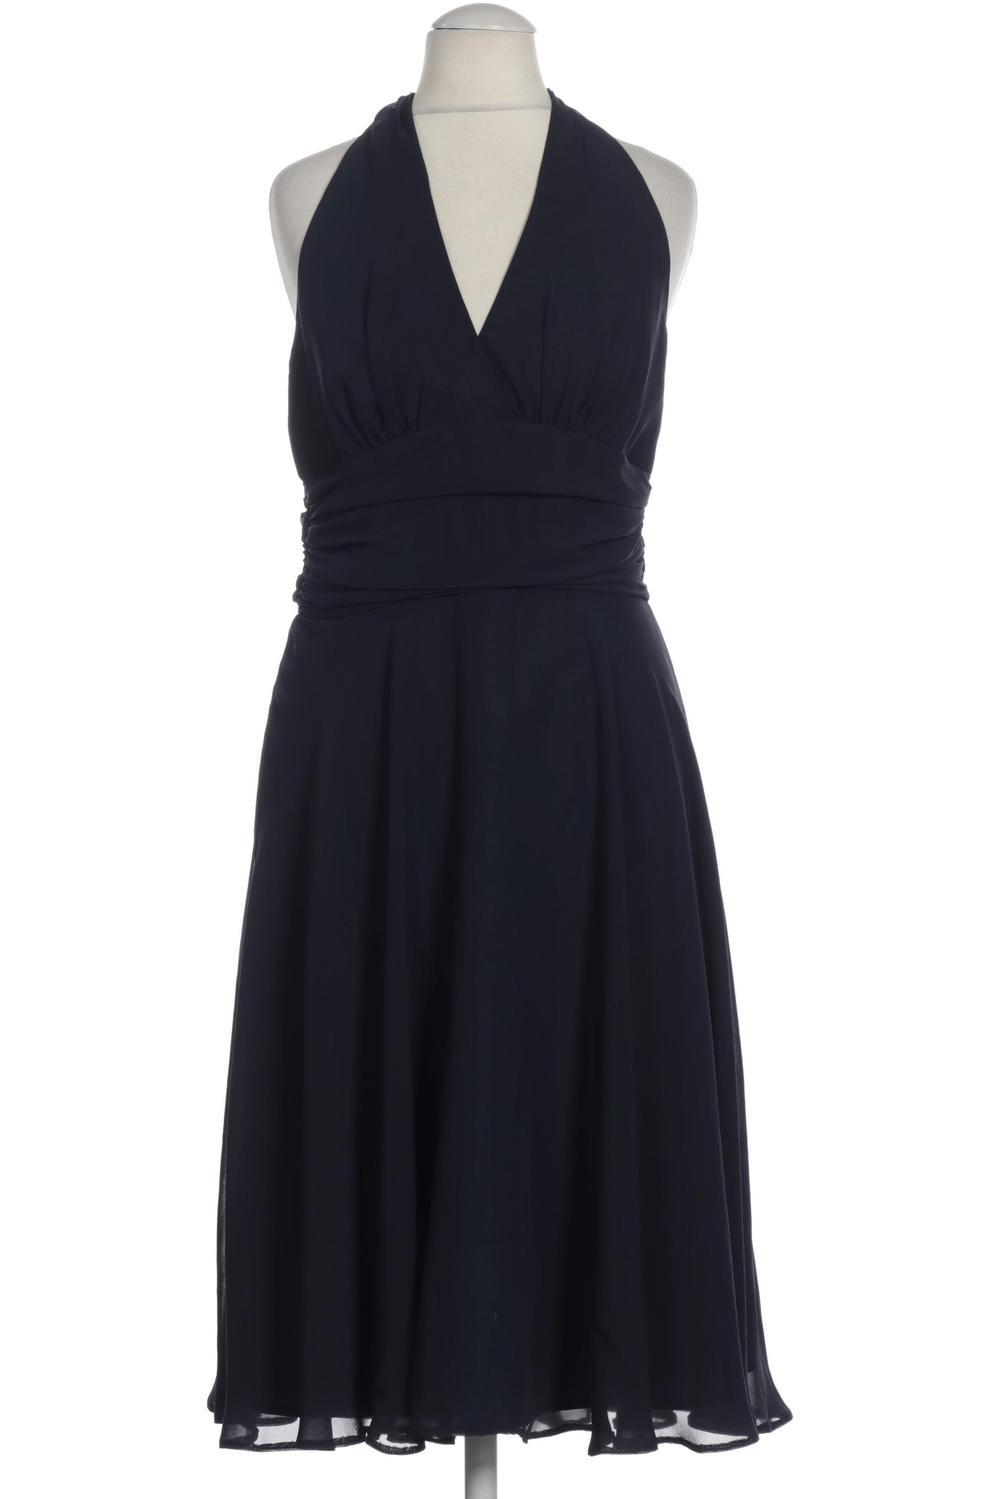 Details zu Montego Kleid Damen Dress Damenkleid Gr. DE 36 blau #78d4830